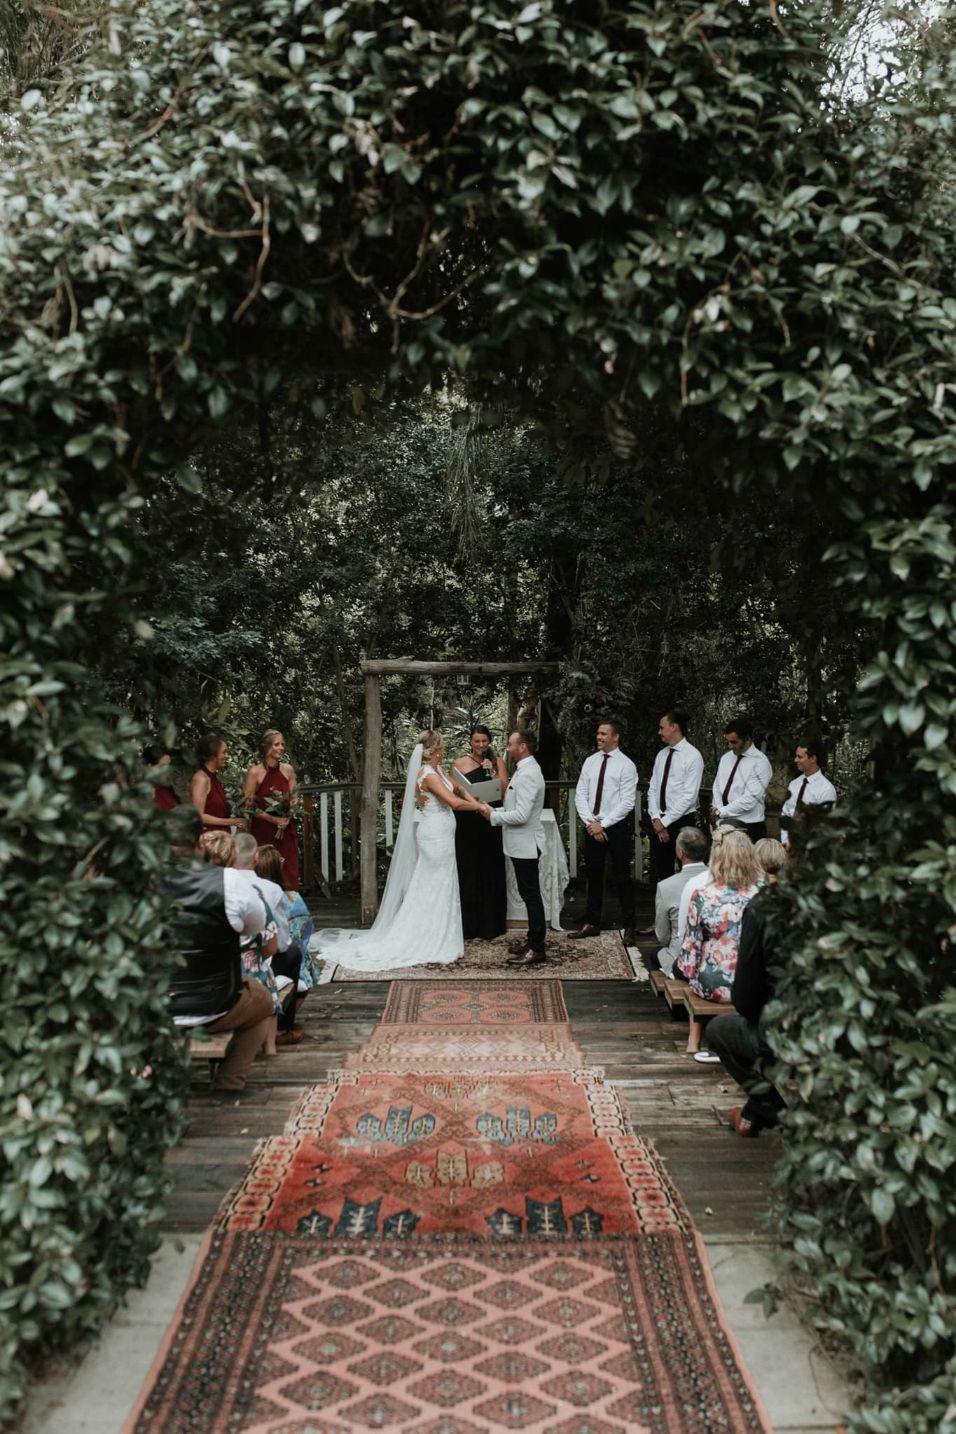 klee photography wedding hire furniture decor boho weddings styling